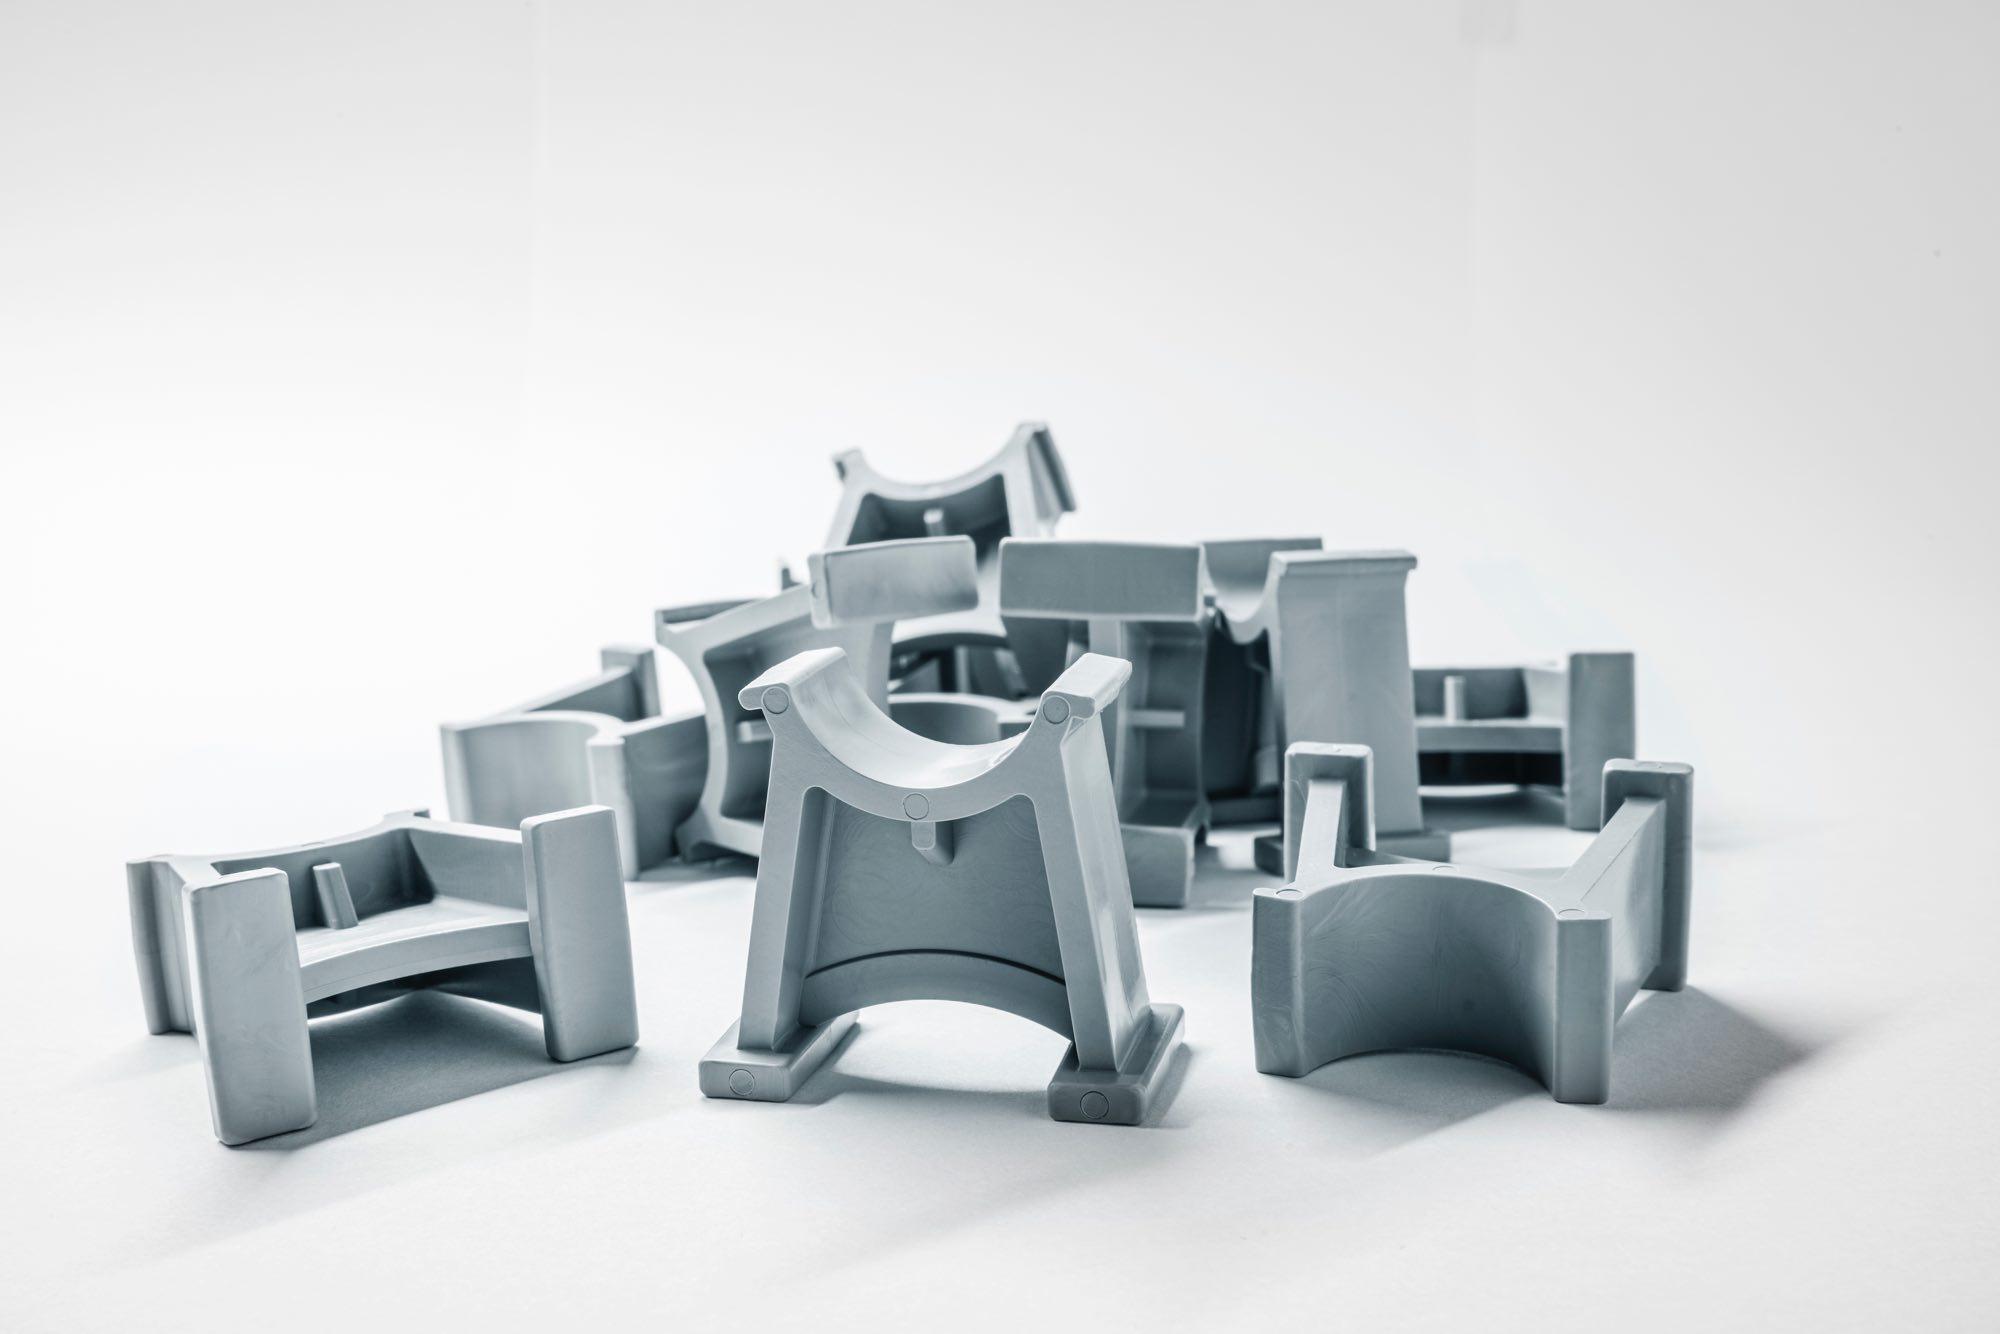 Műanyag betonacél távtartó - Med-Plast 2000 Kft.